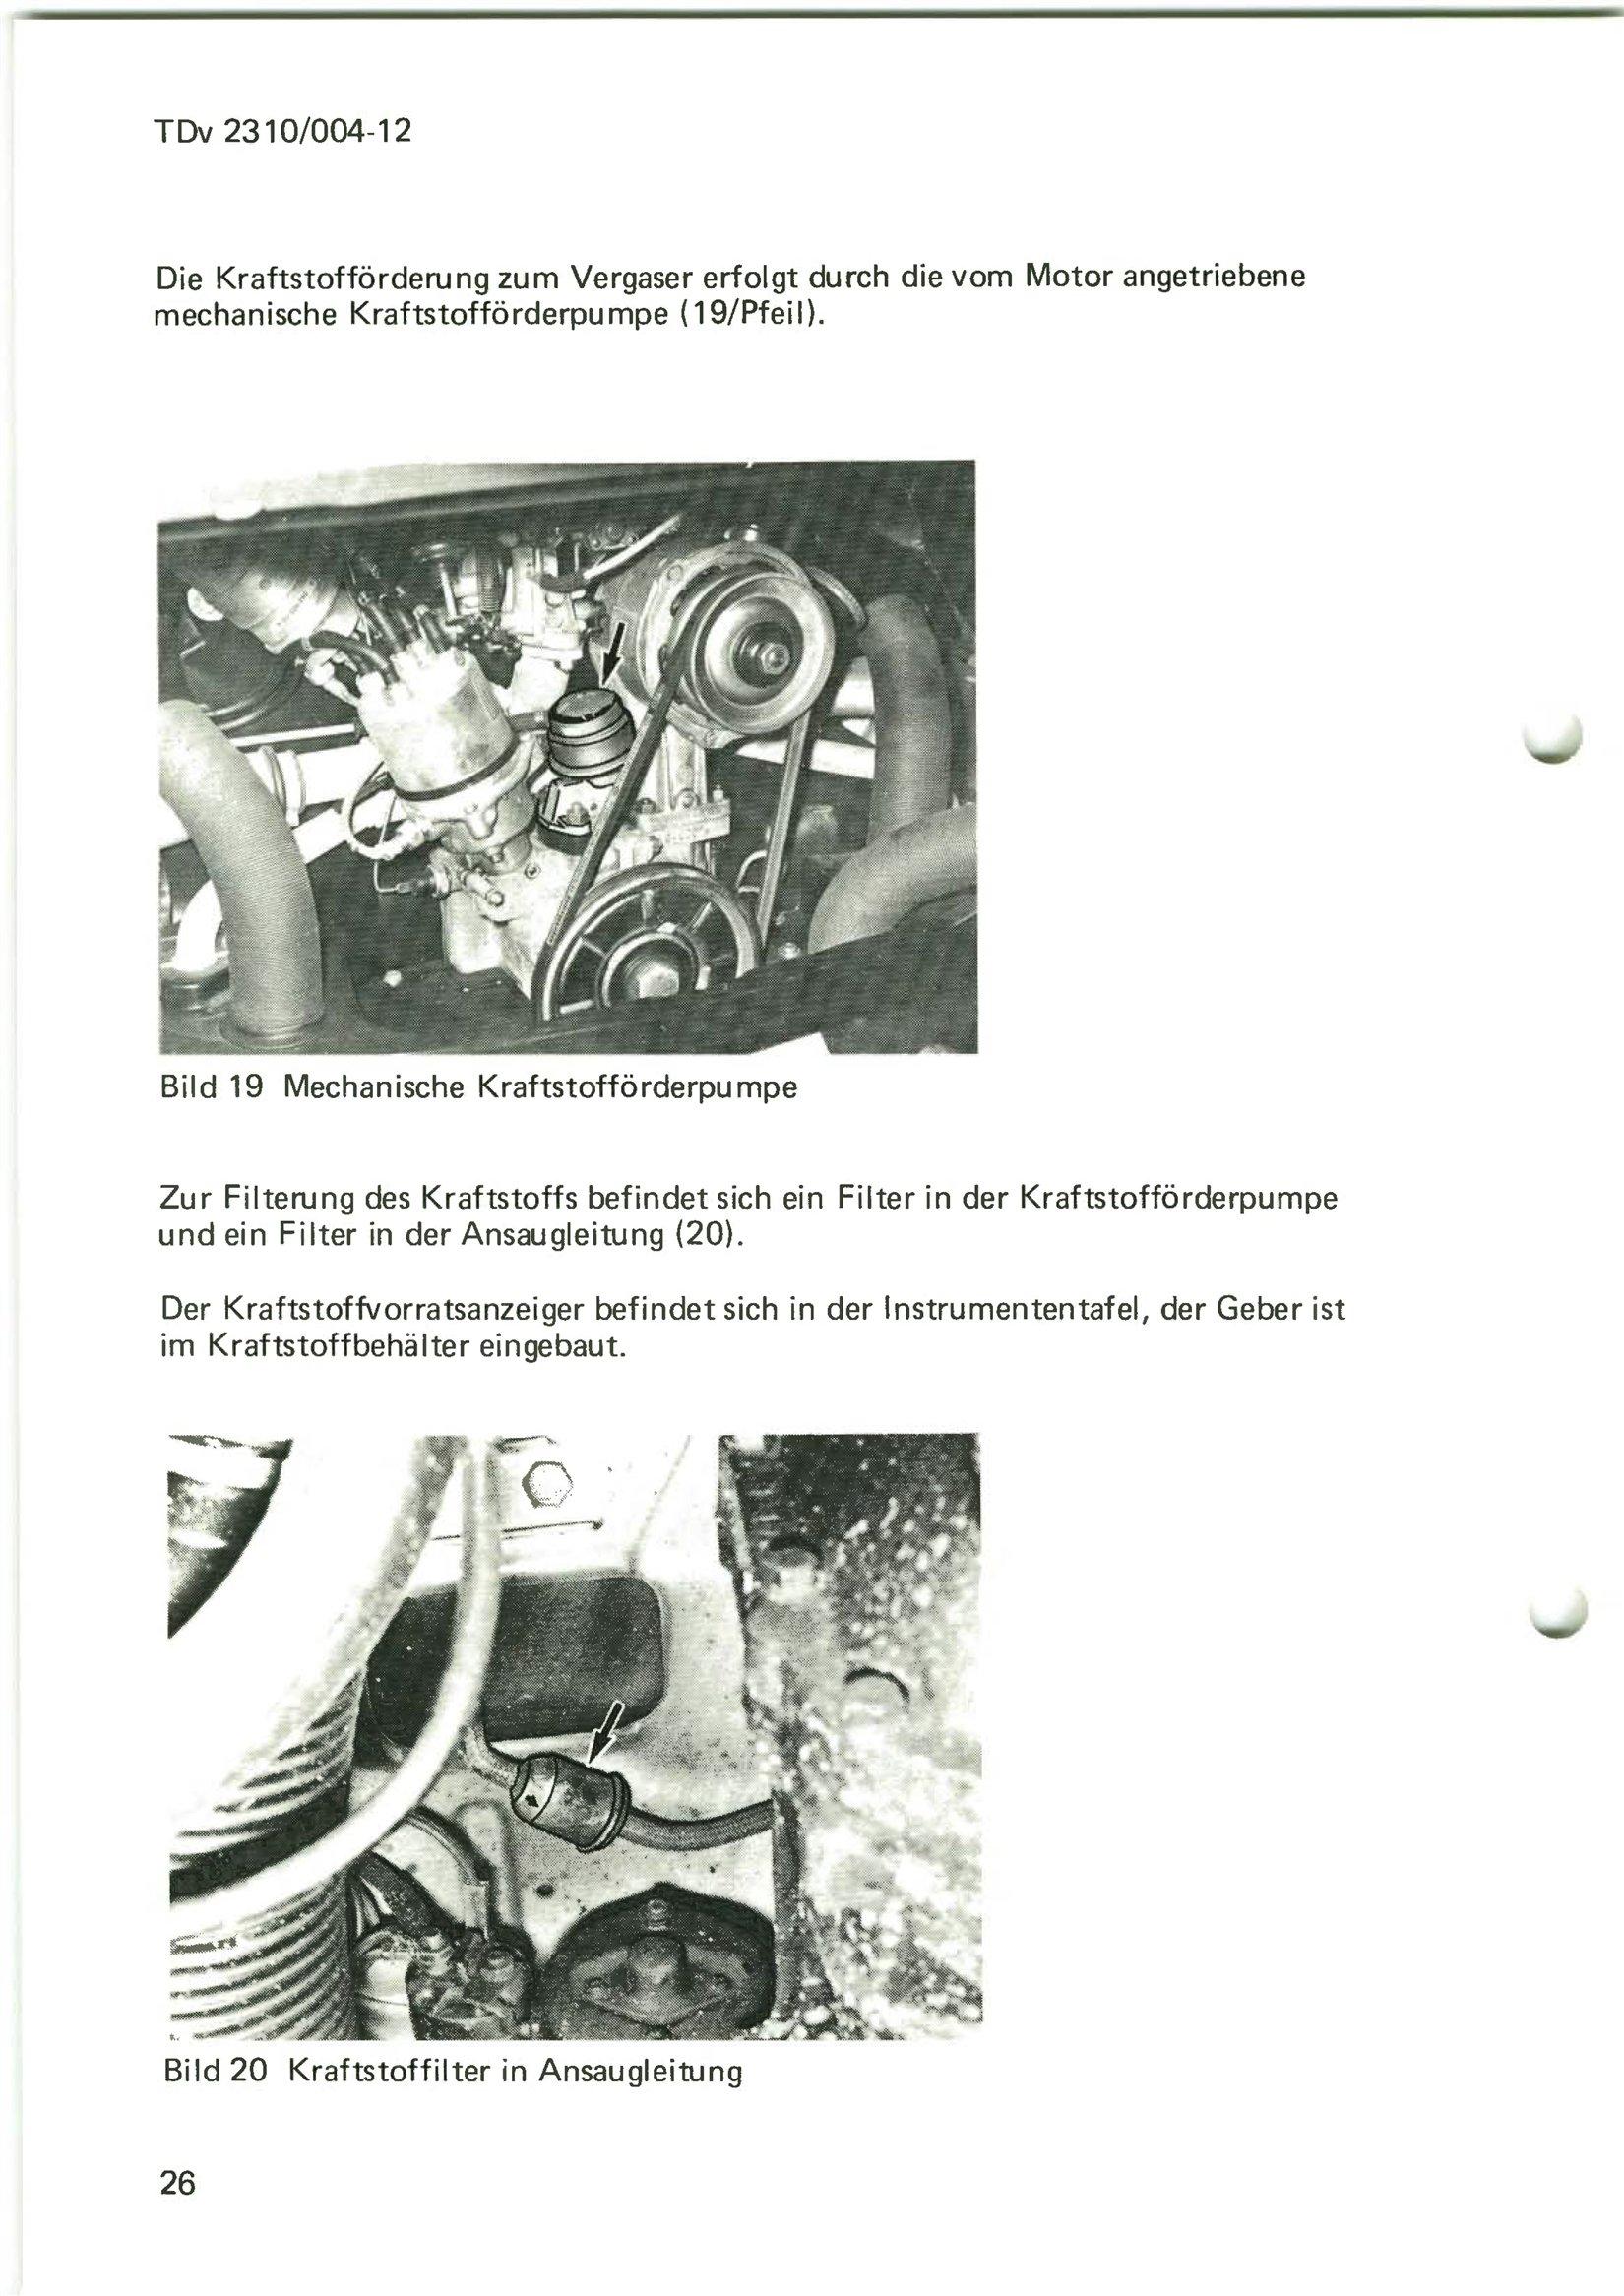 TheSamba.com :: 1984 VW Bus German Army Manual